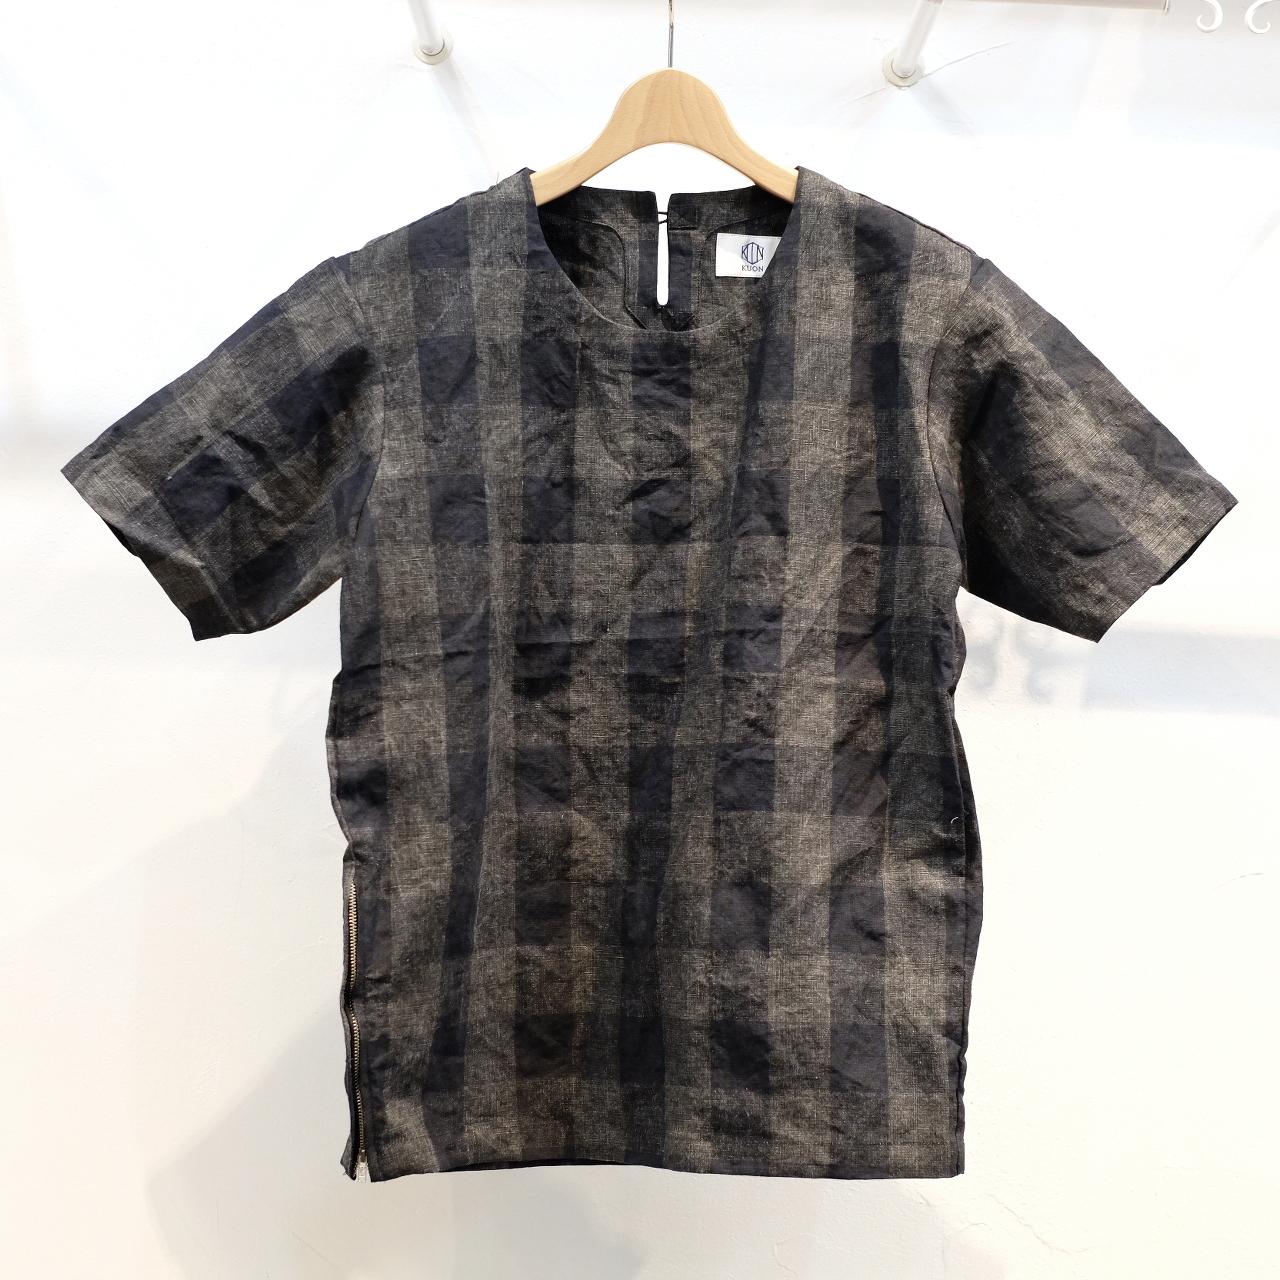 KUON(クオン) 麻・墨染チェック 半袖プルオーバーシャツ(カットソー)